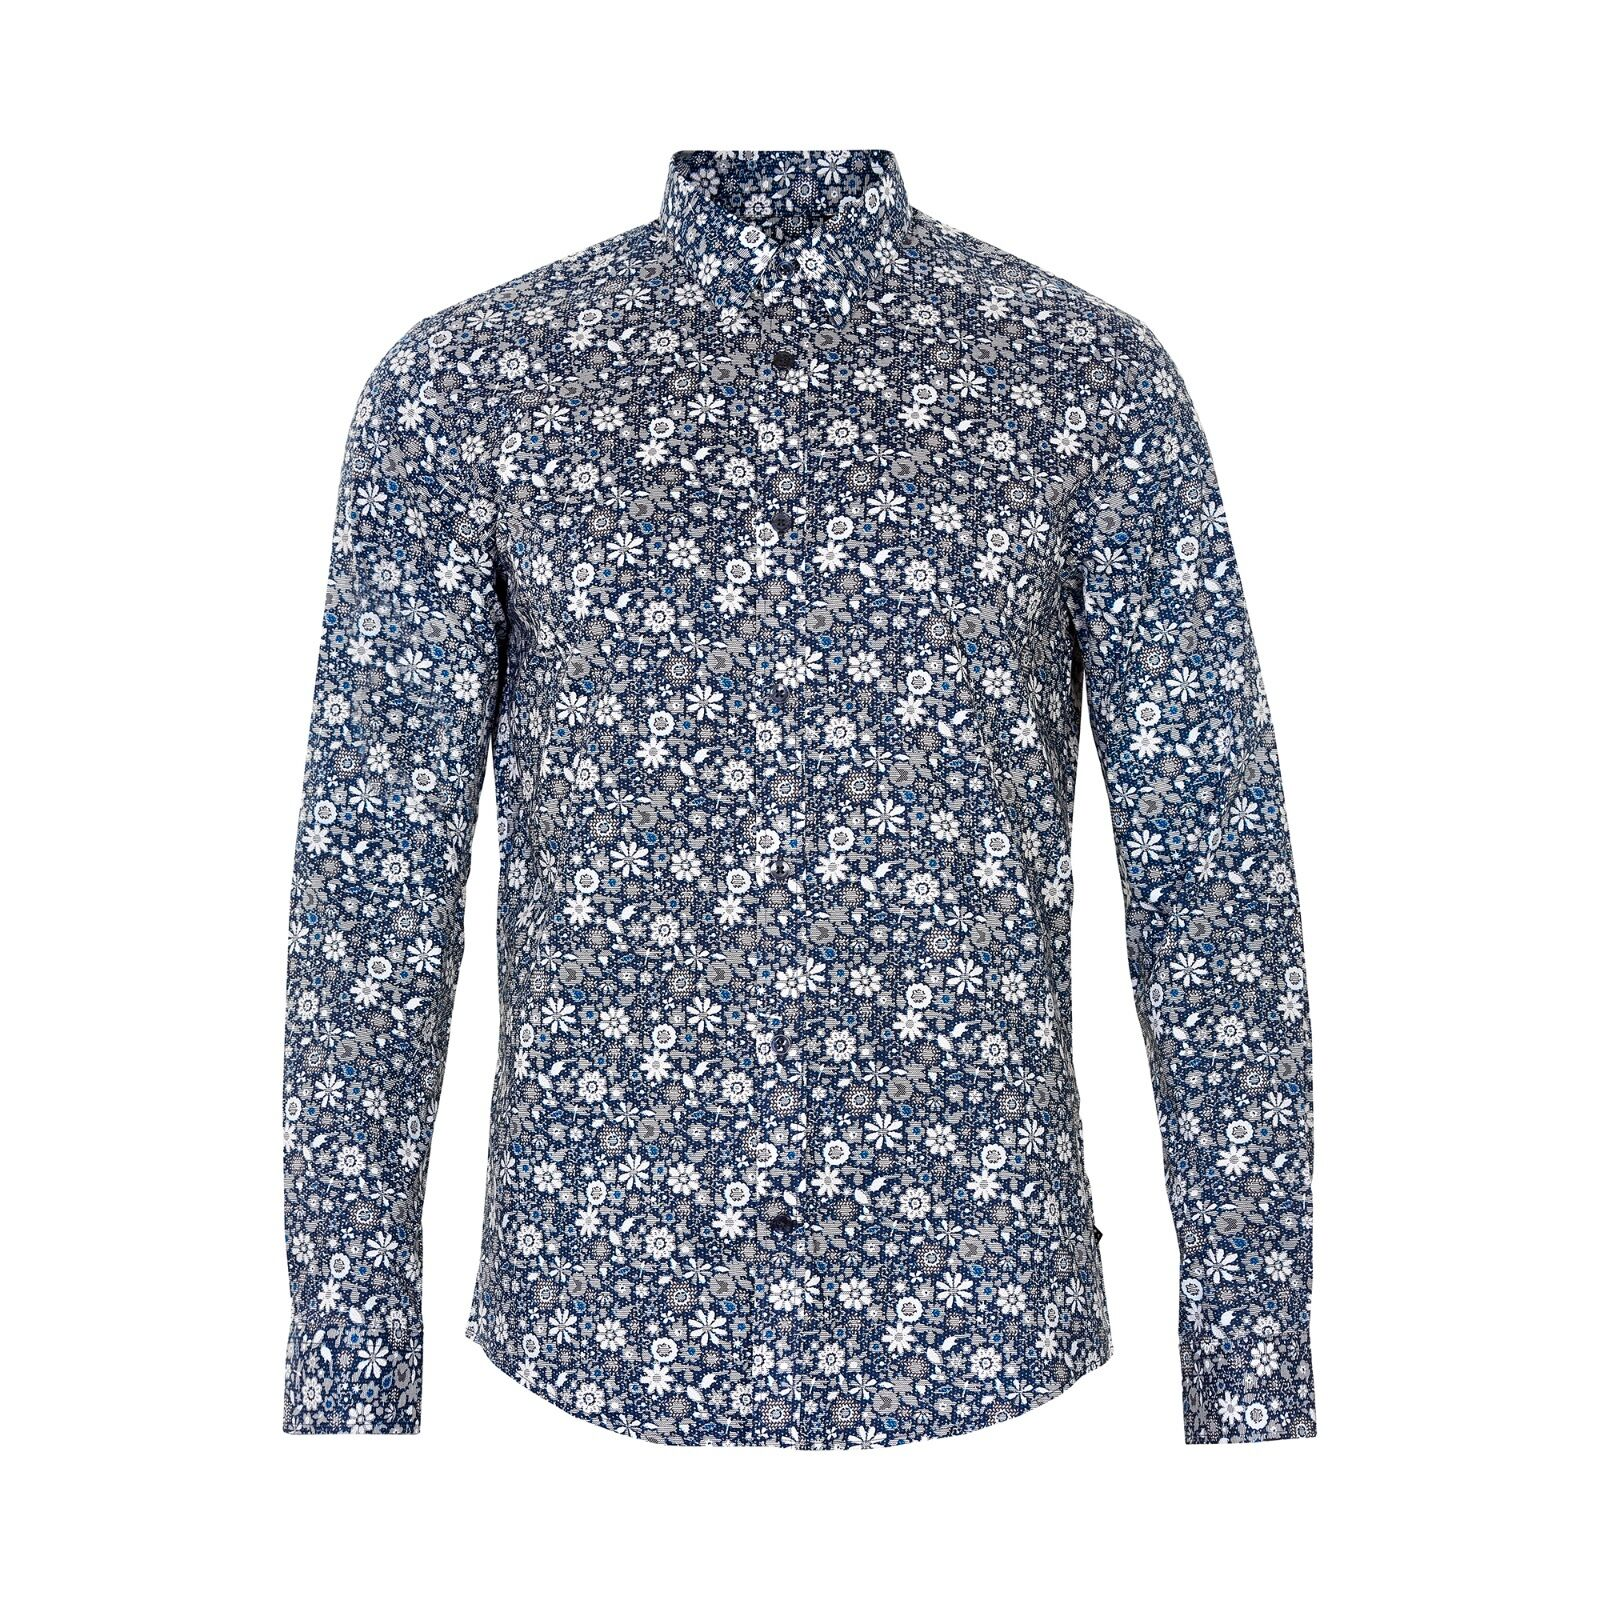 Matinique trostol organici di stampa shirt Chambrey Blu - 3XL NUOVI SS17